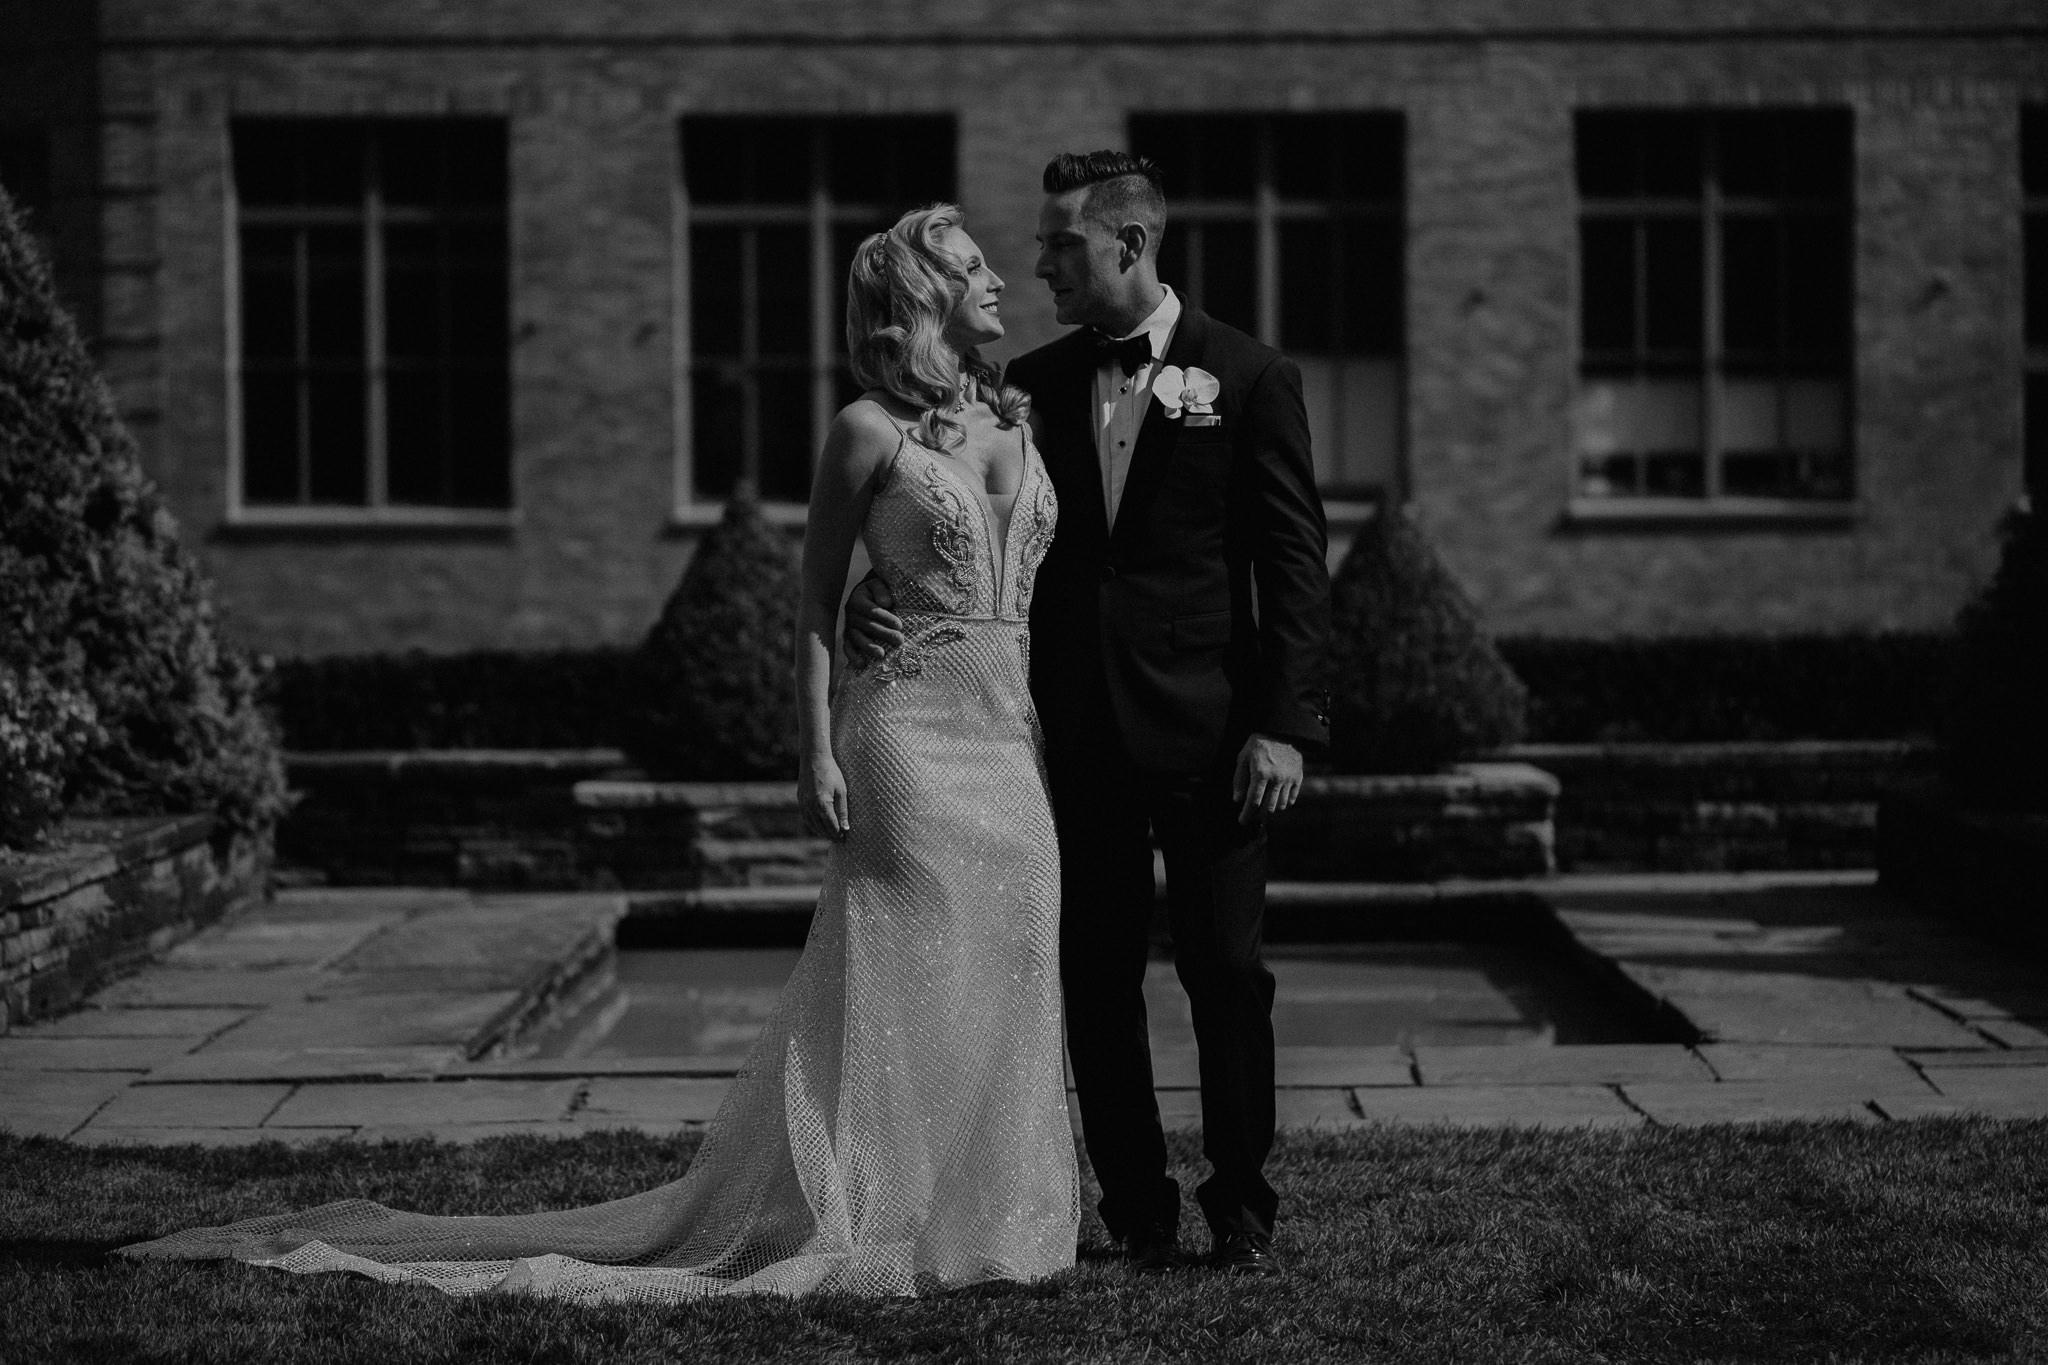 M+J_NYC_Wedding_StPatricks_30Rock_RainbowRoom_070.jpg